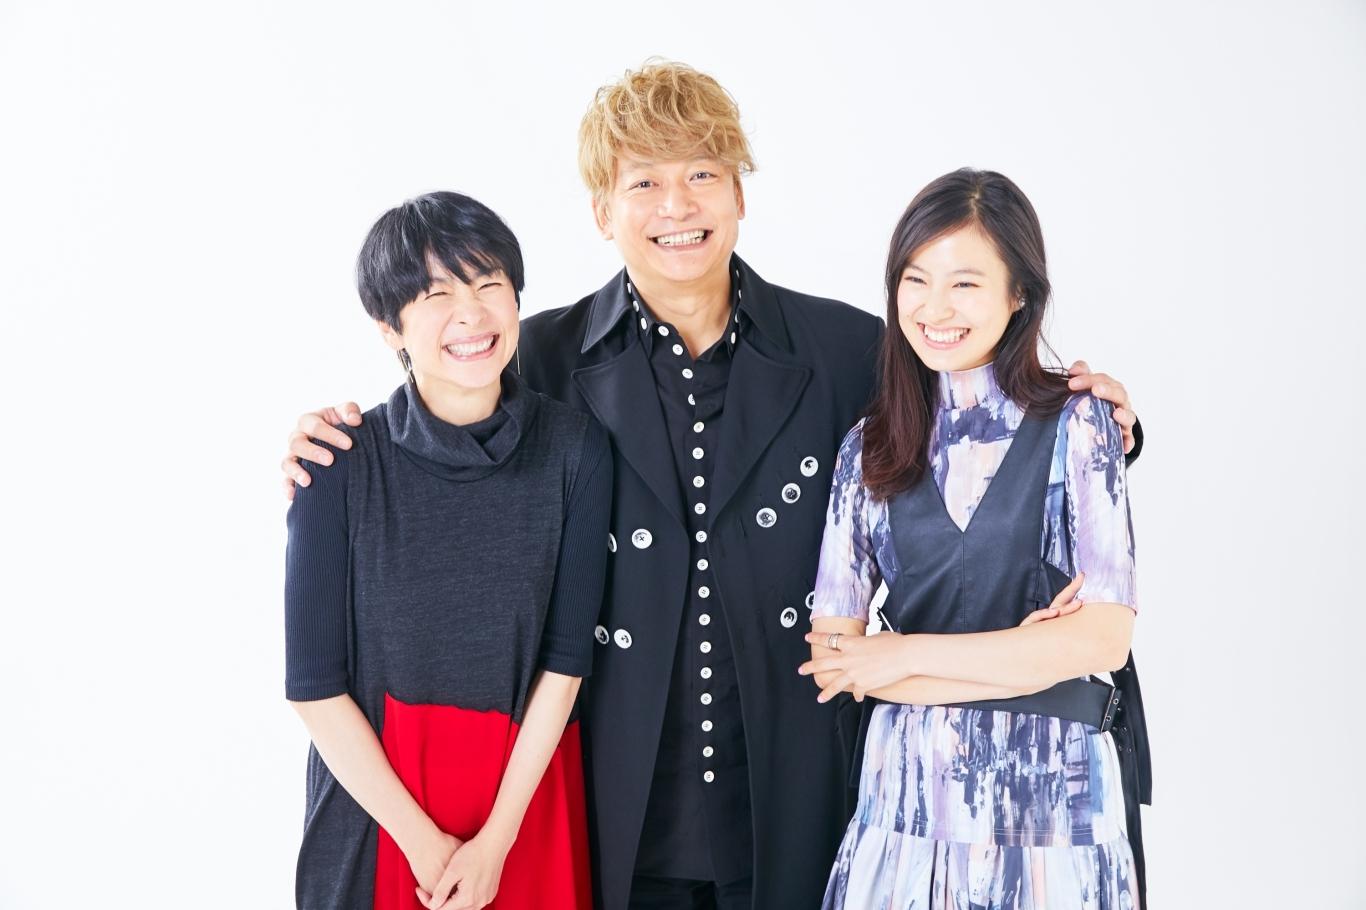 左から、西田尚美、香取慎吾、恒松祐里 撮影=鈴木久美子